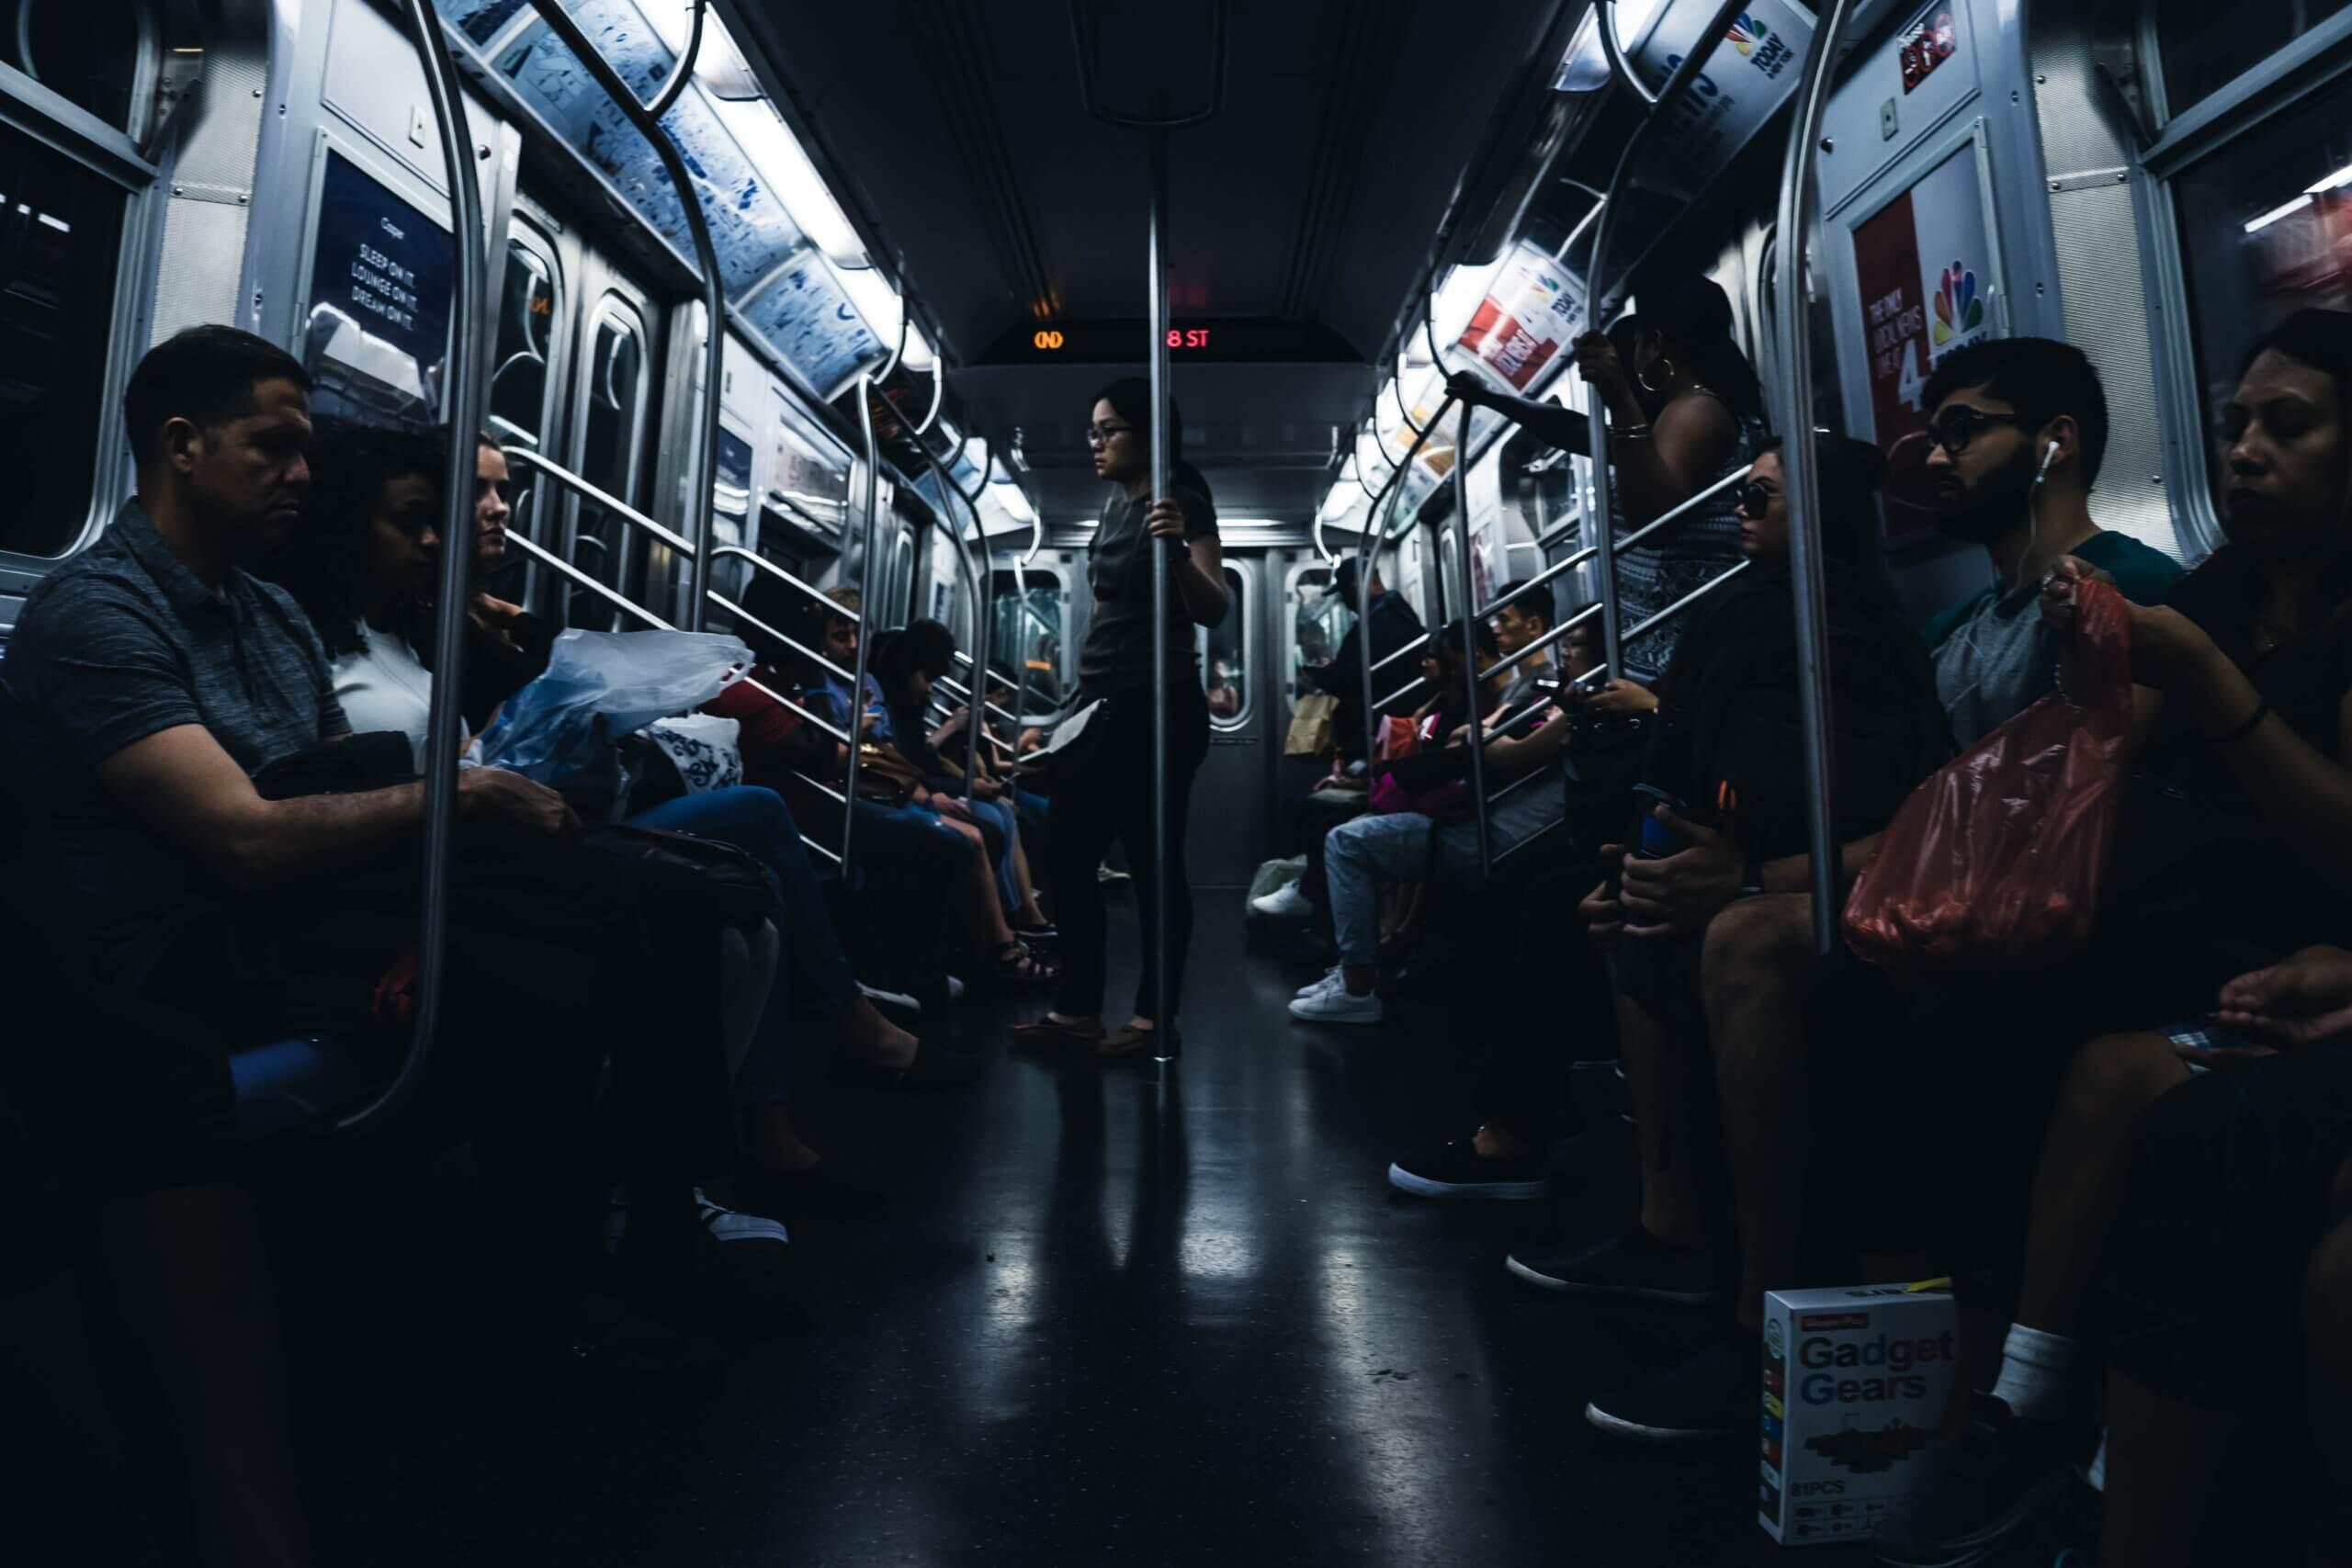 通勤・通学時間の全国平均は1時間19分程度